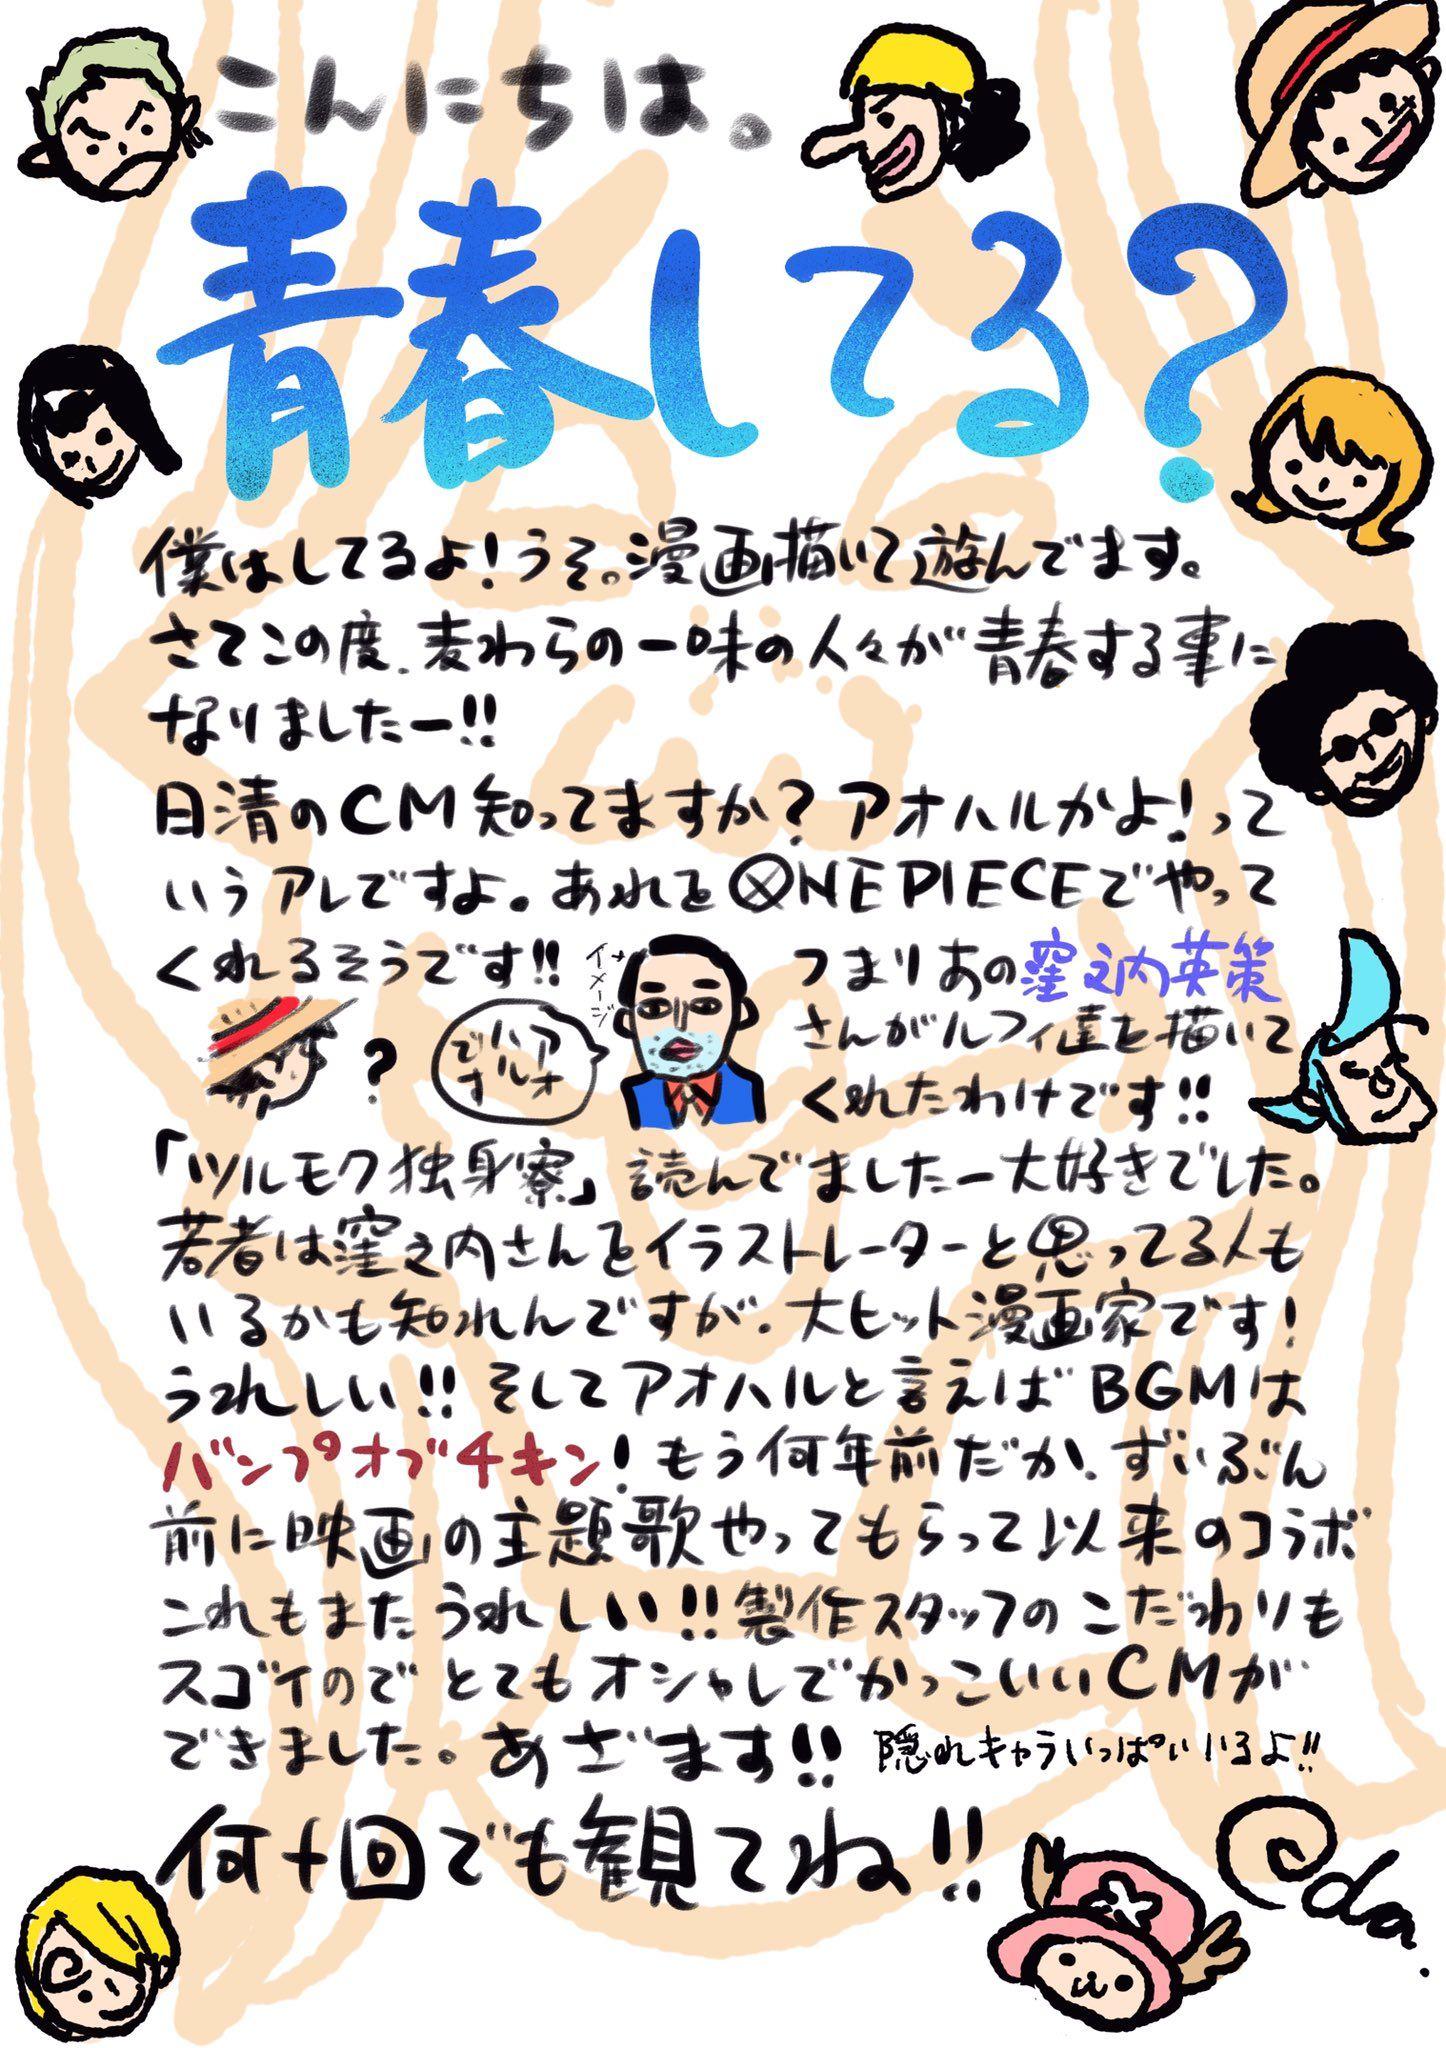 ONE PIECE スタッフ【公式】 on(画像あり) | 窪之内英策, 尾田栄一郎 ...